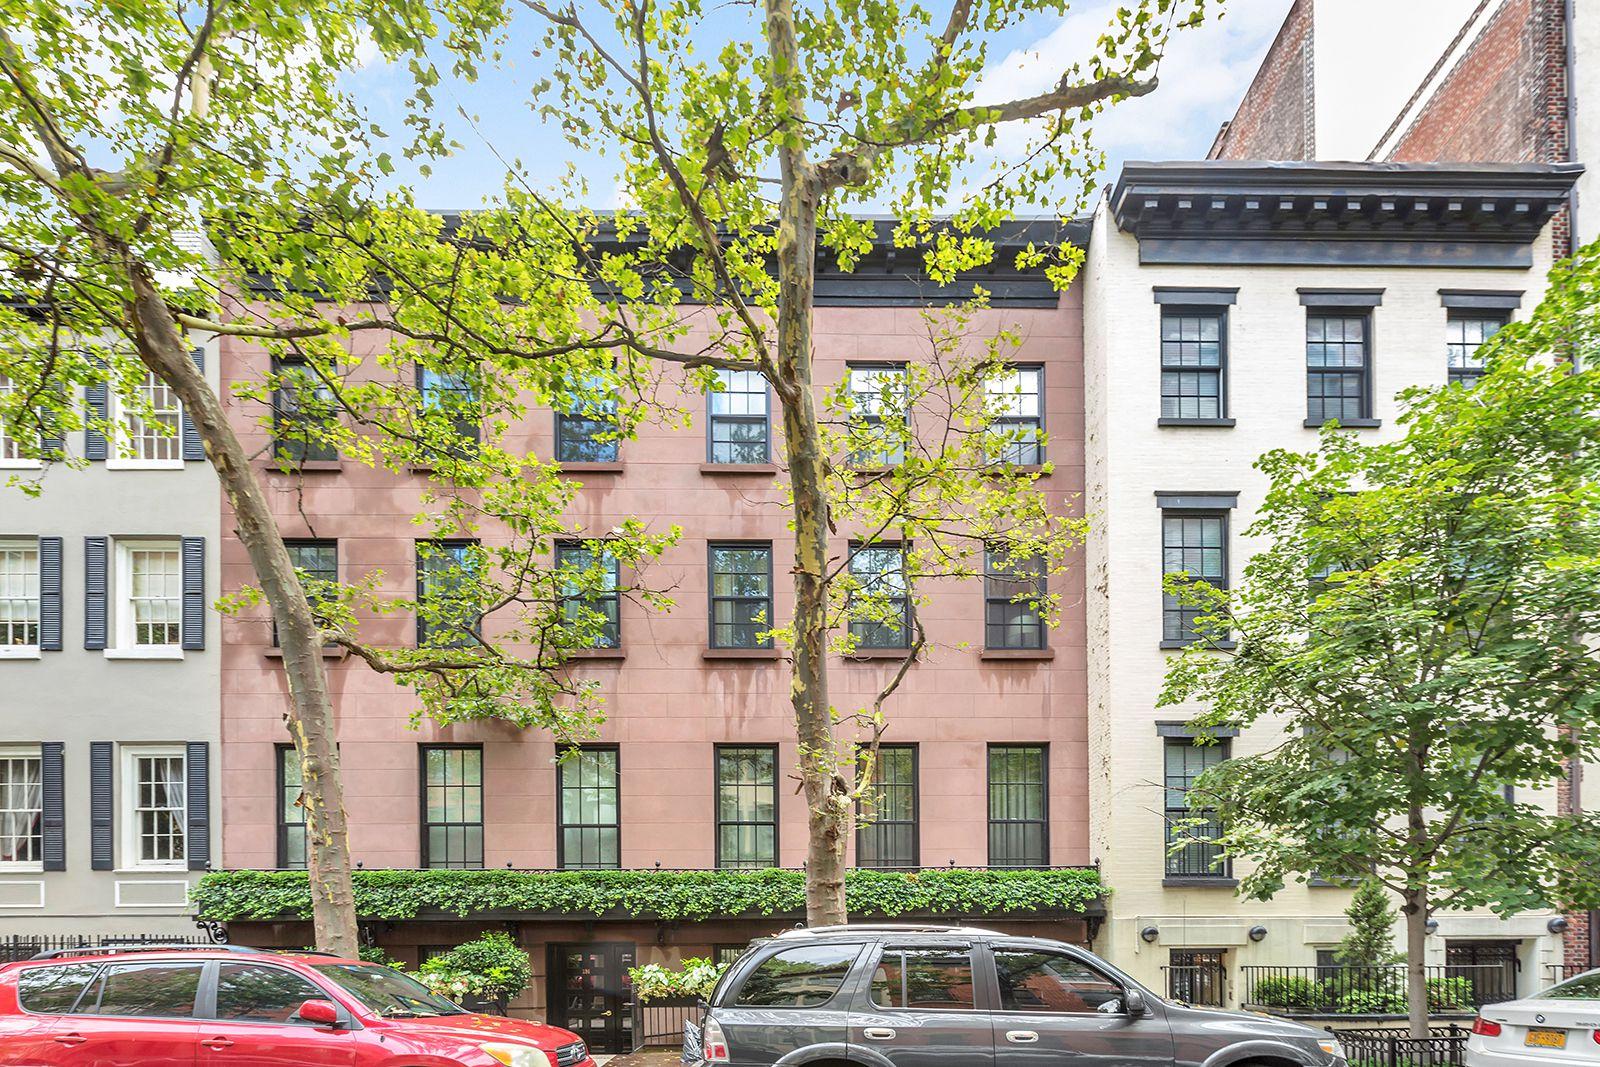 Featured Listing: Boutique Gramercy Triplex Penthouse Lists for $5.79 Million